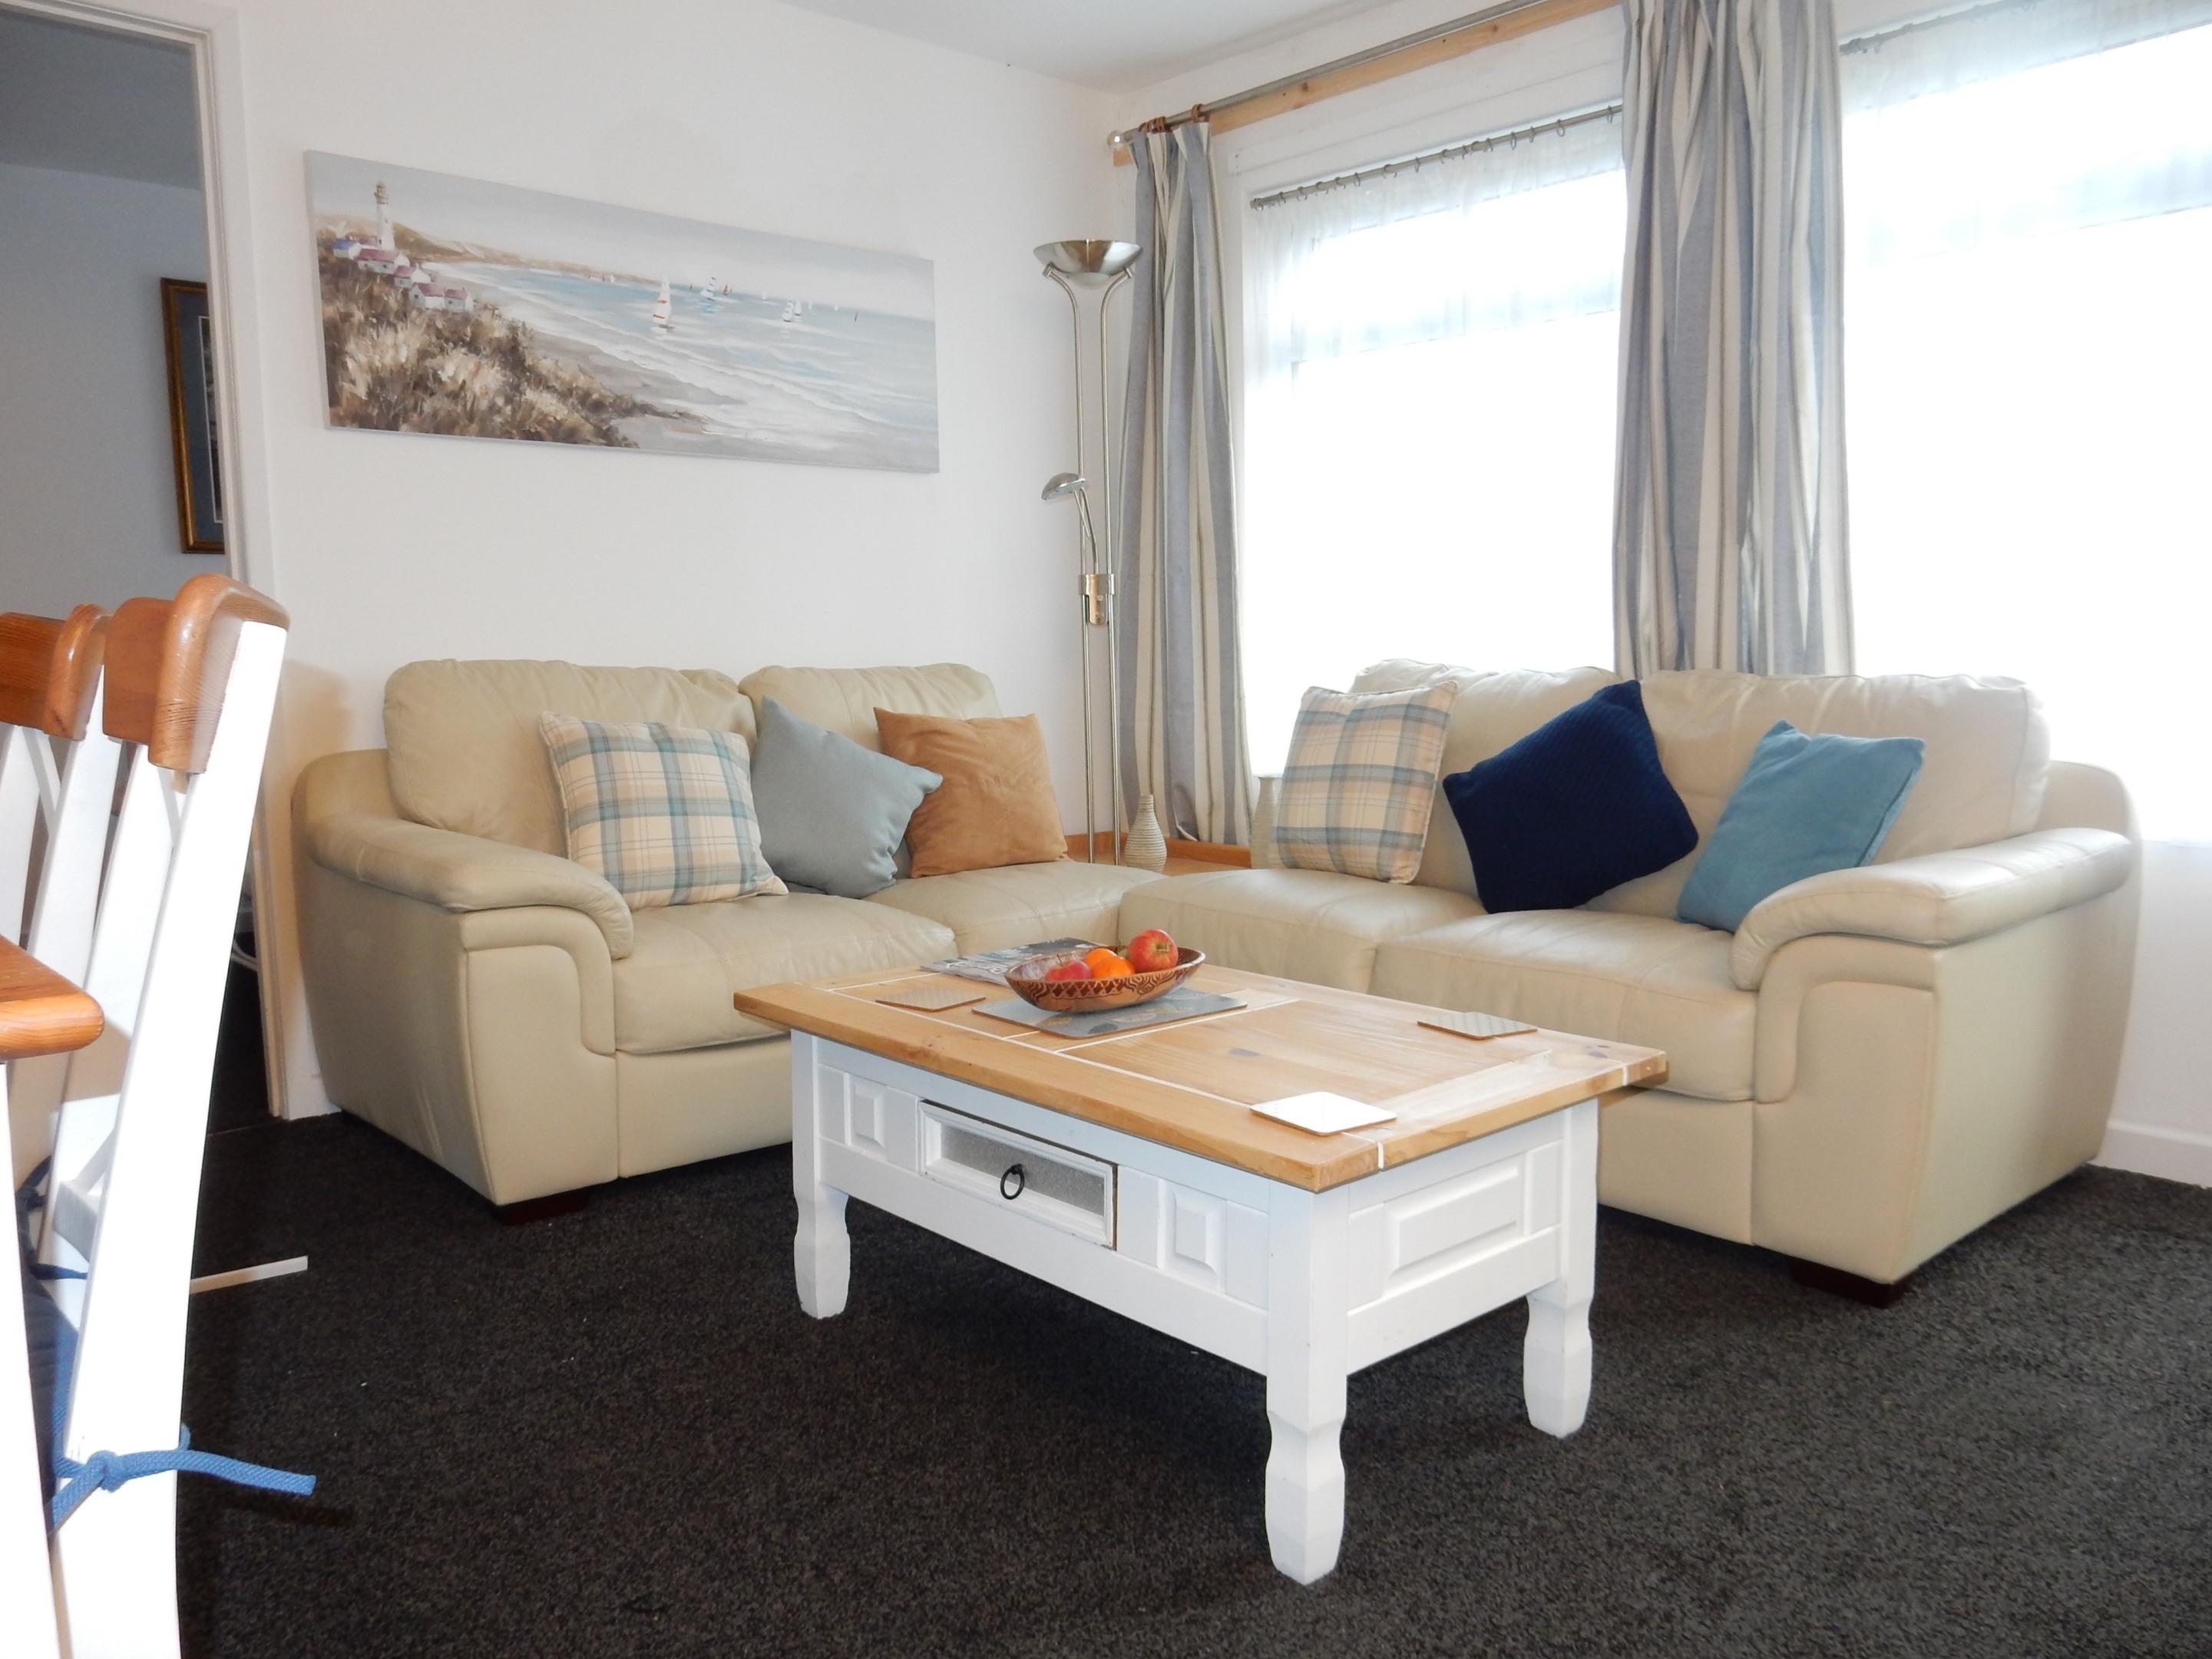 2 bedroom-Chalet-Classic-Ensuite-Park View - Base Rate